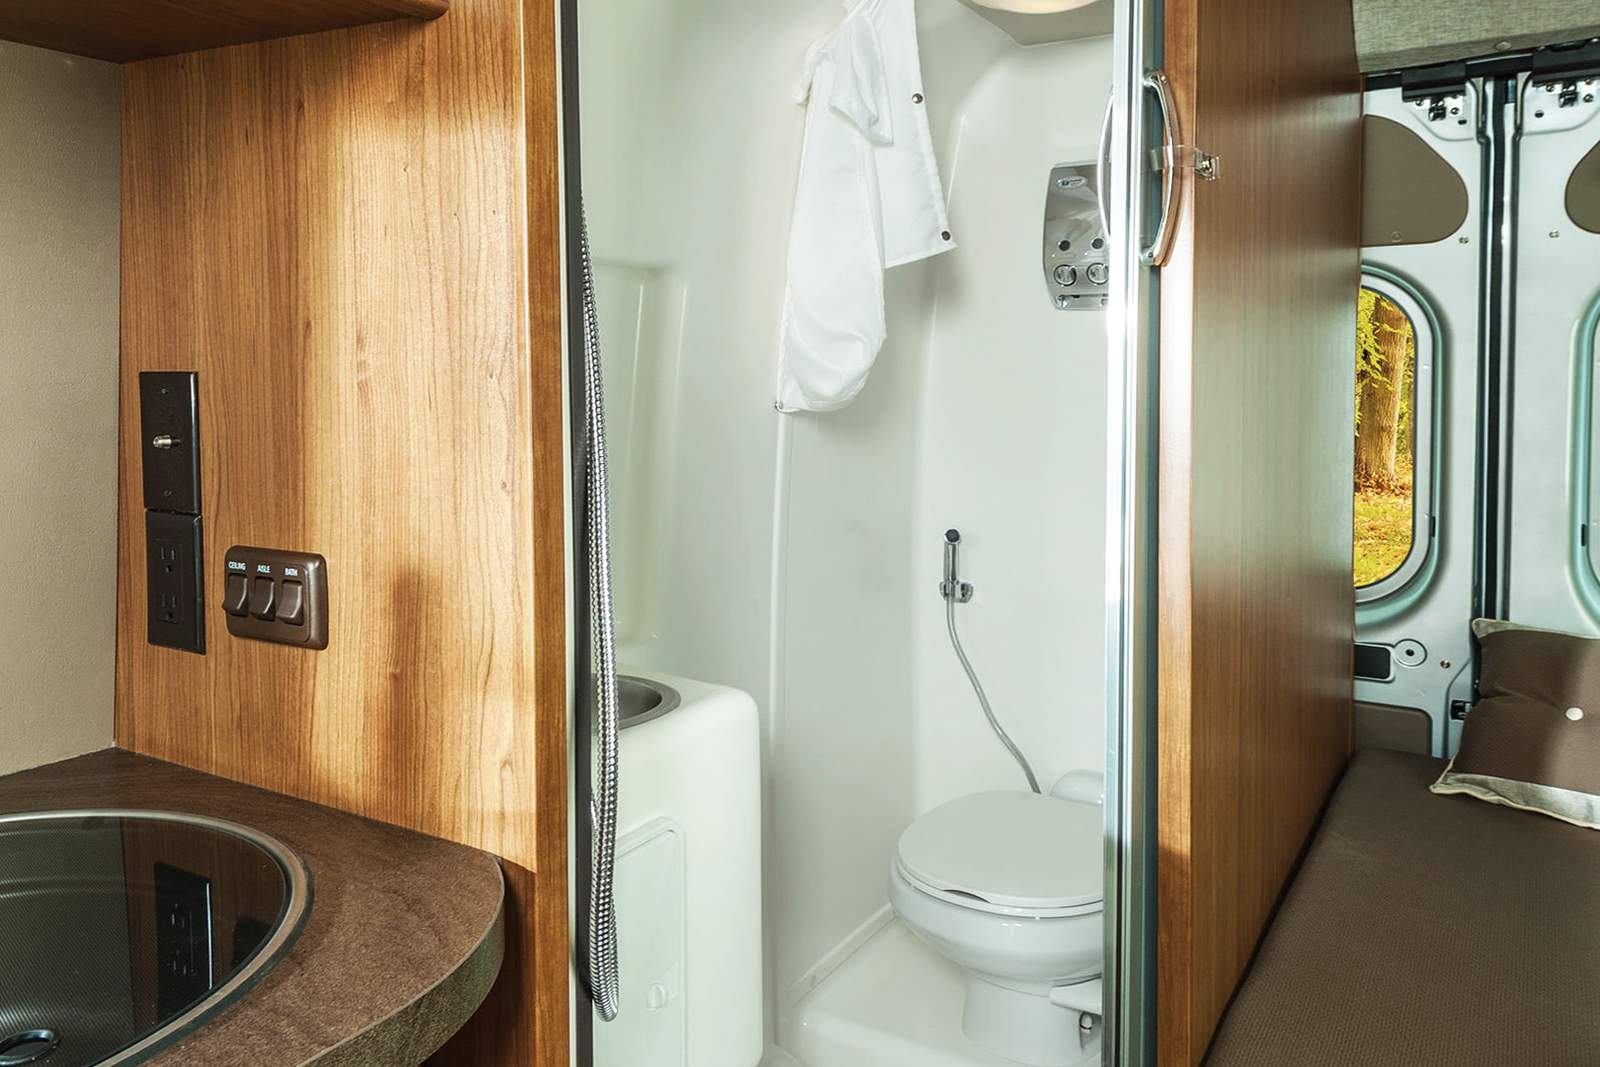 wohnmobile usa best time rv van conversion b 21 canusa. Black Bedroom Furniture Sets. Home Design Ideas